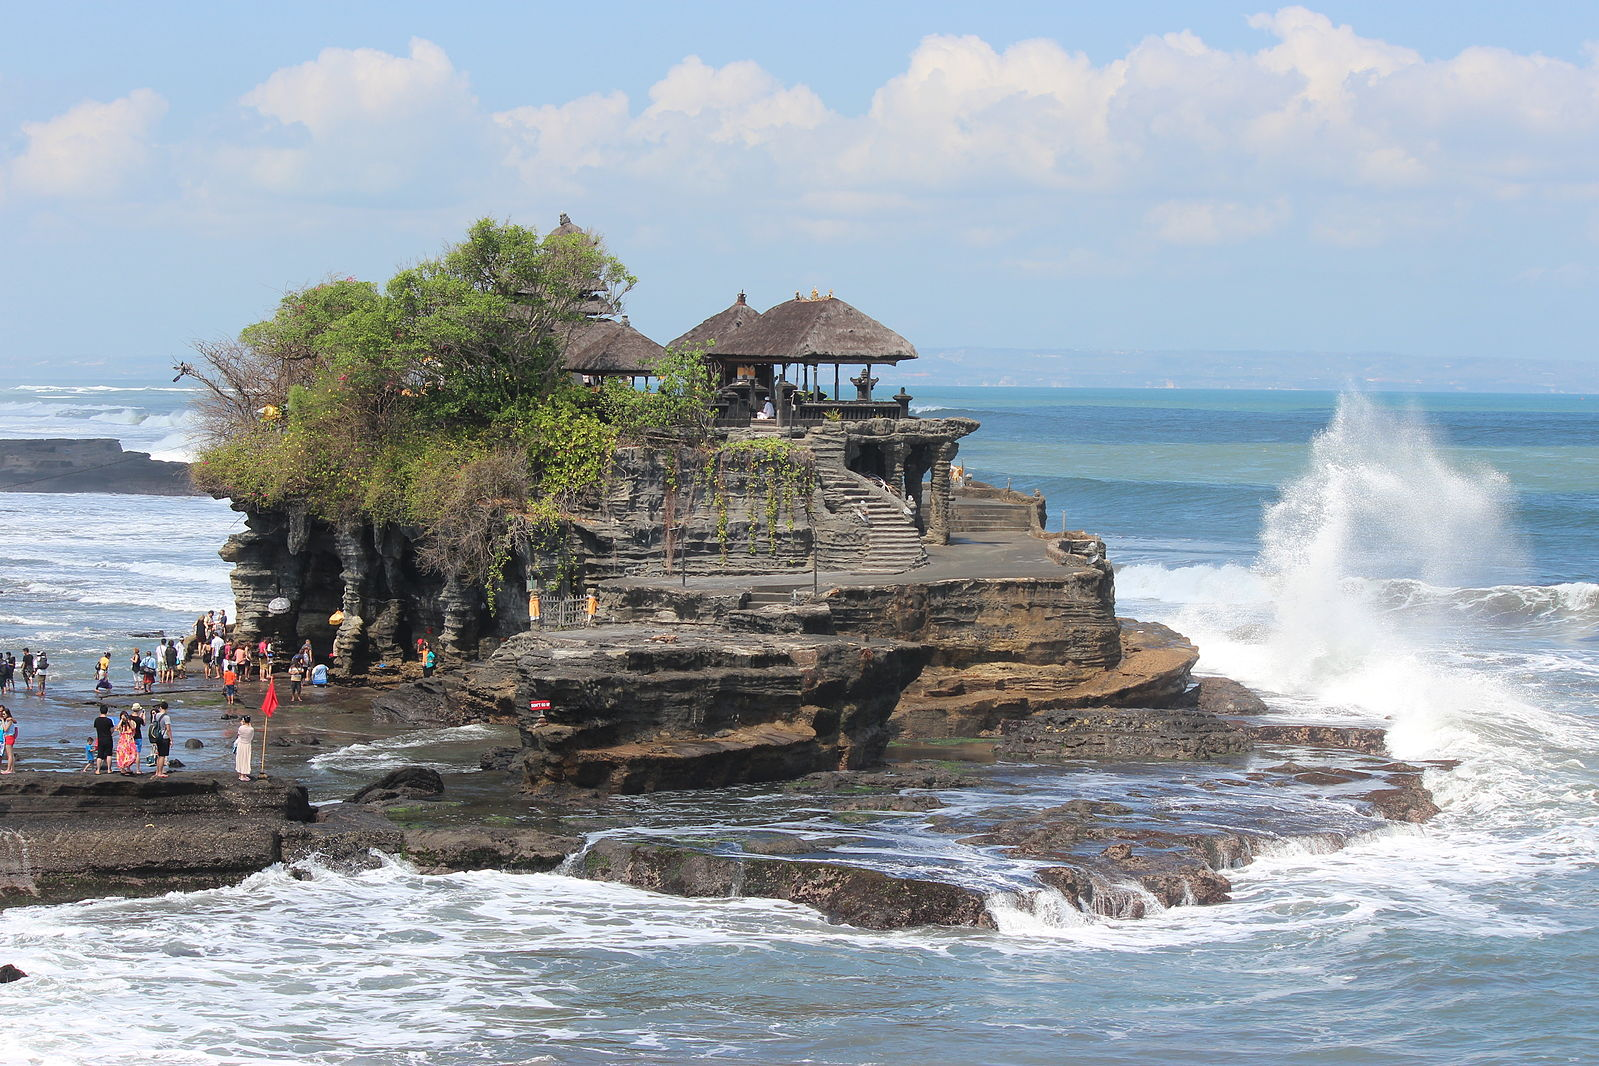 Difference Between Bali and Bora Bora